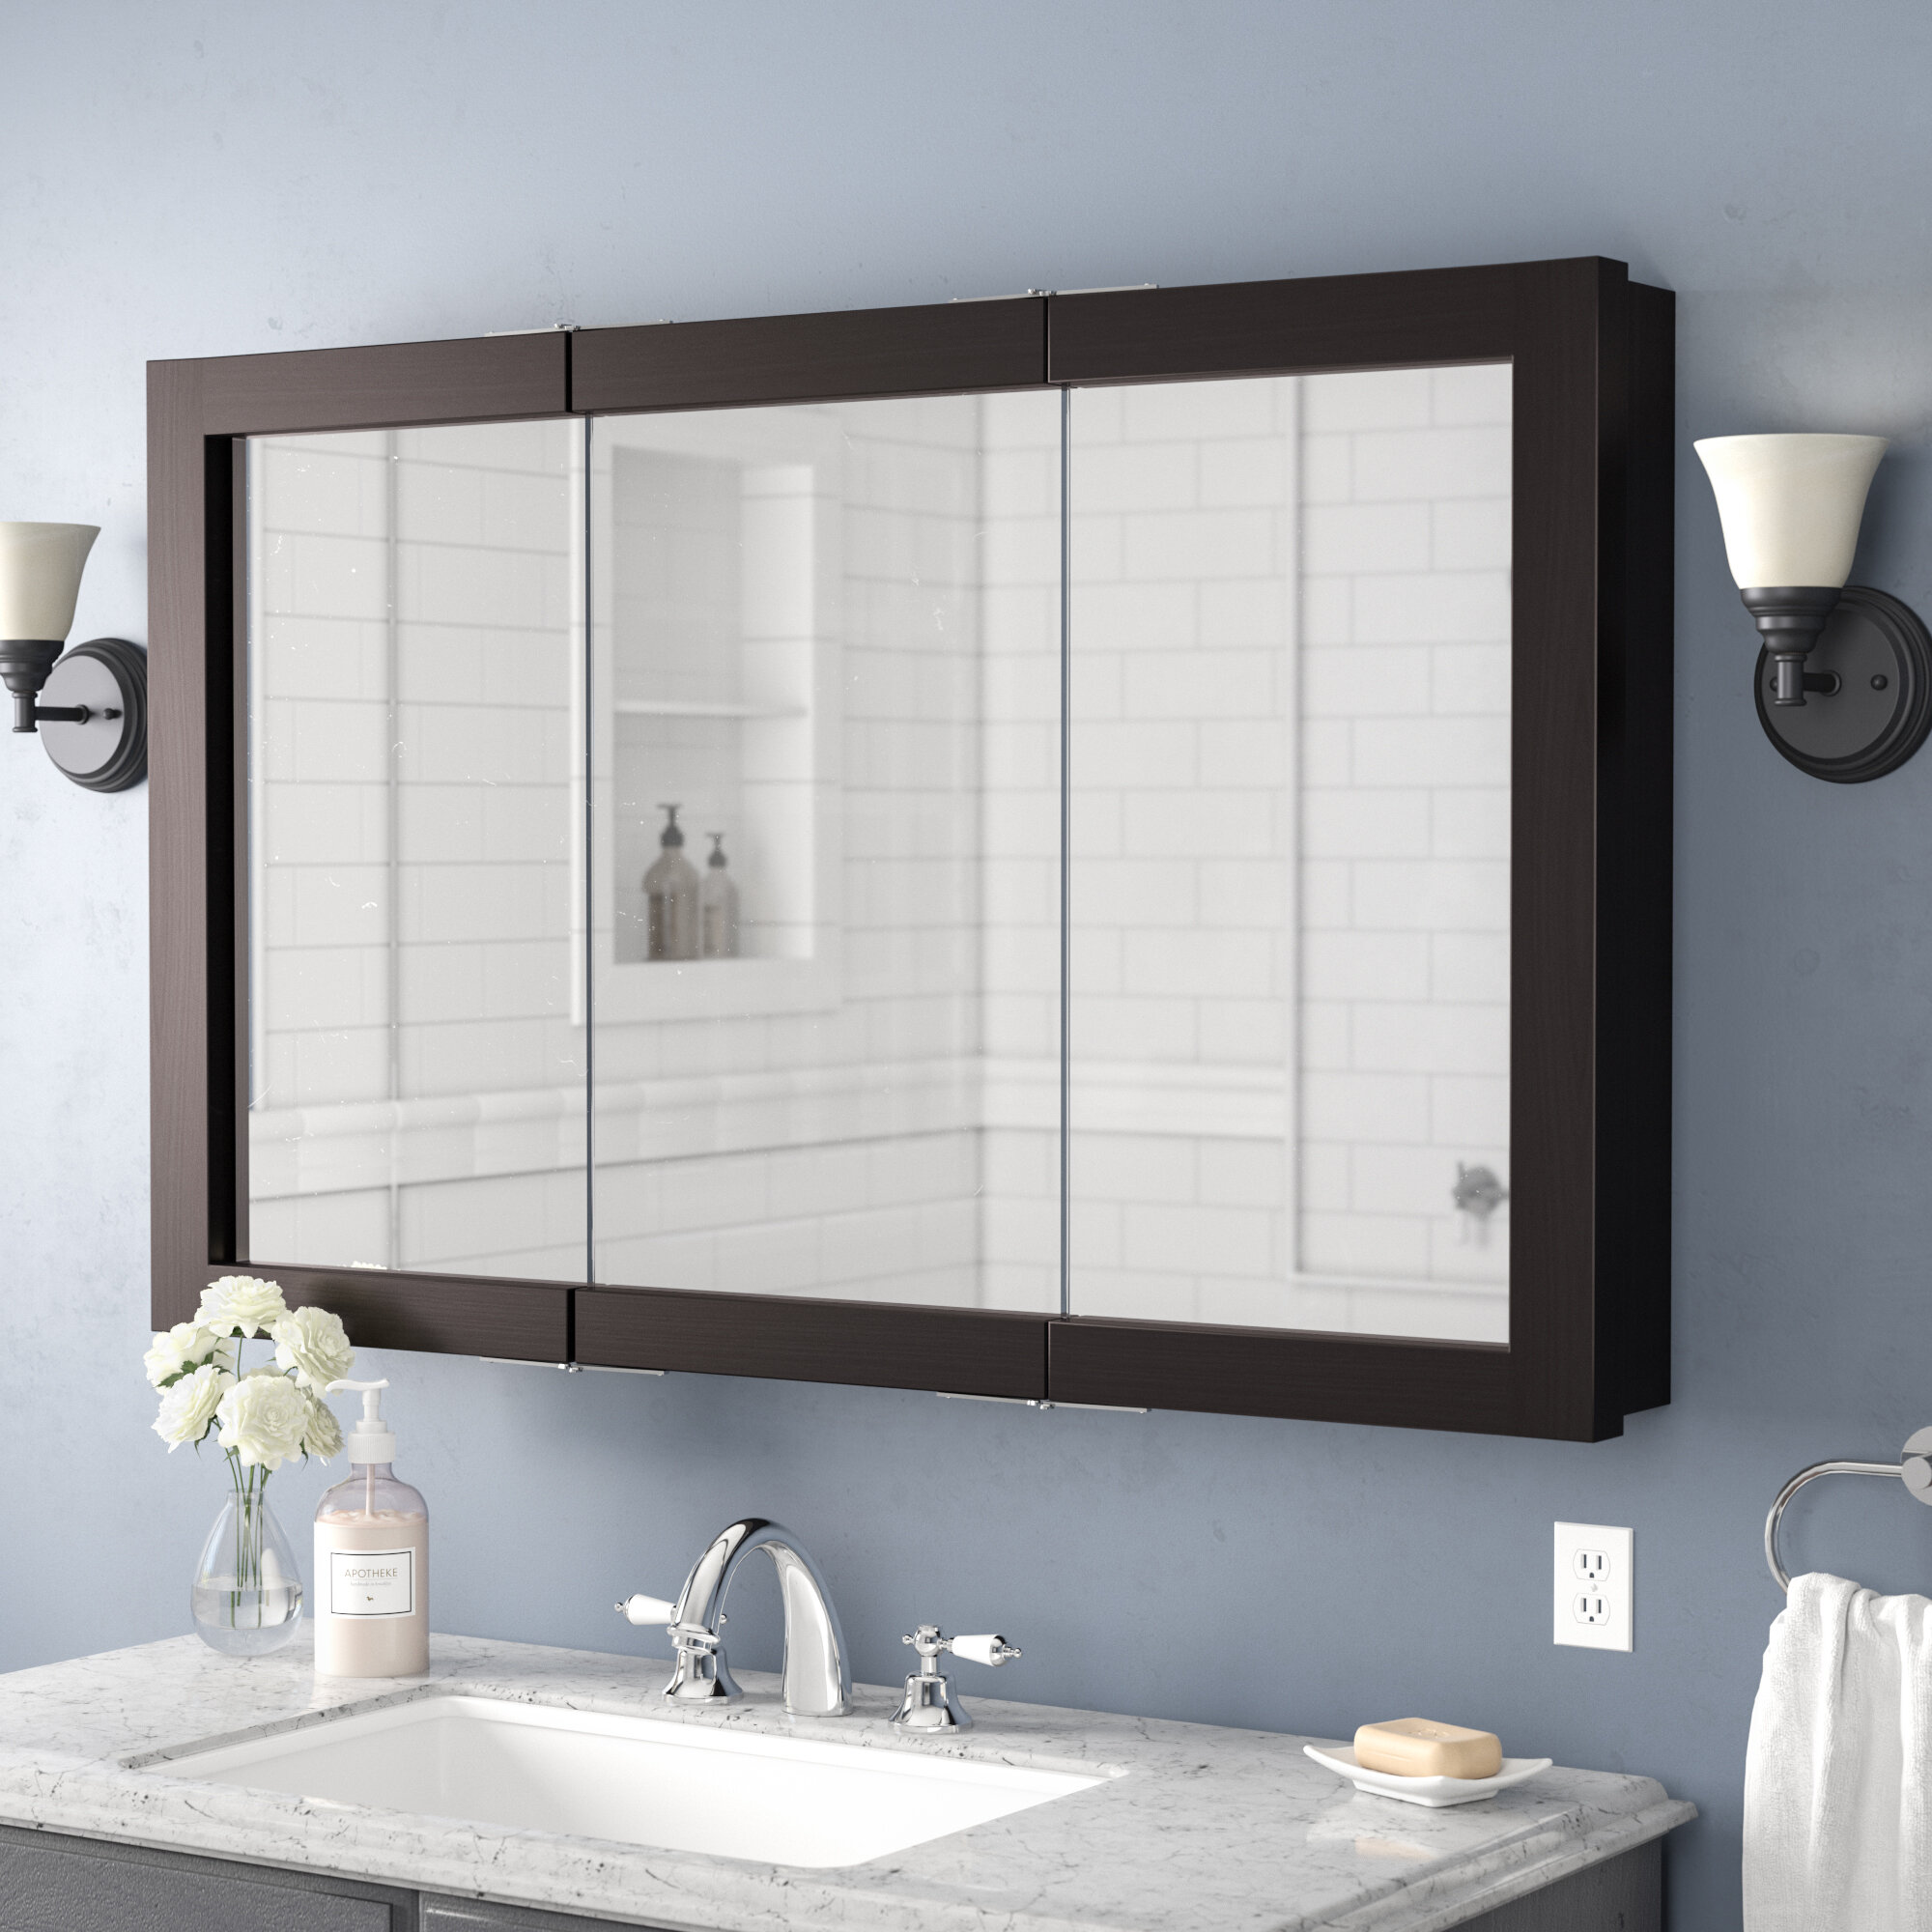 Bathroom Cabinet With Mirror Sale Kitchen And Bath